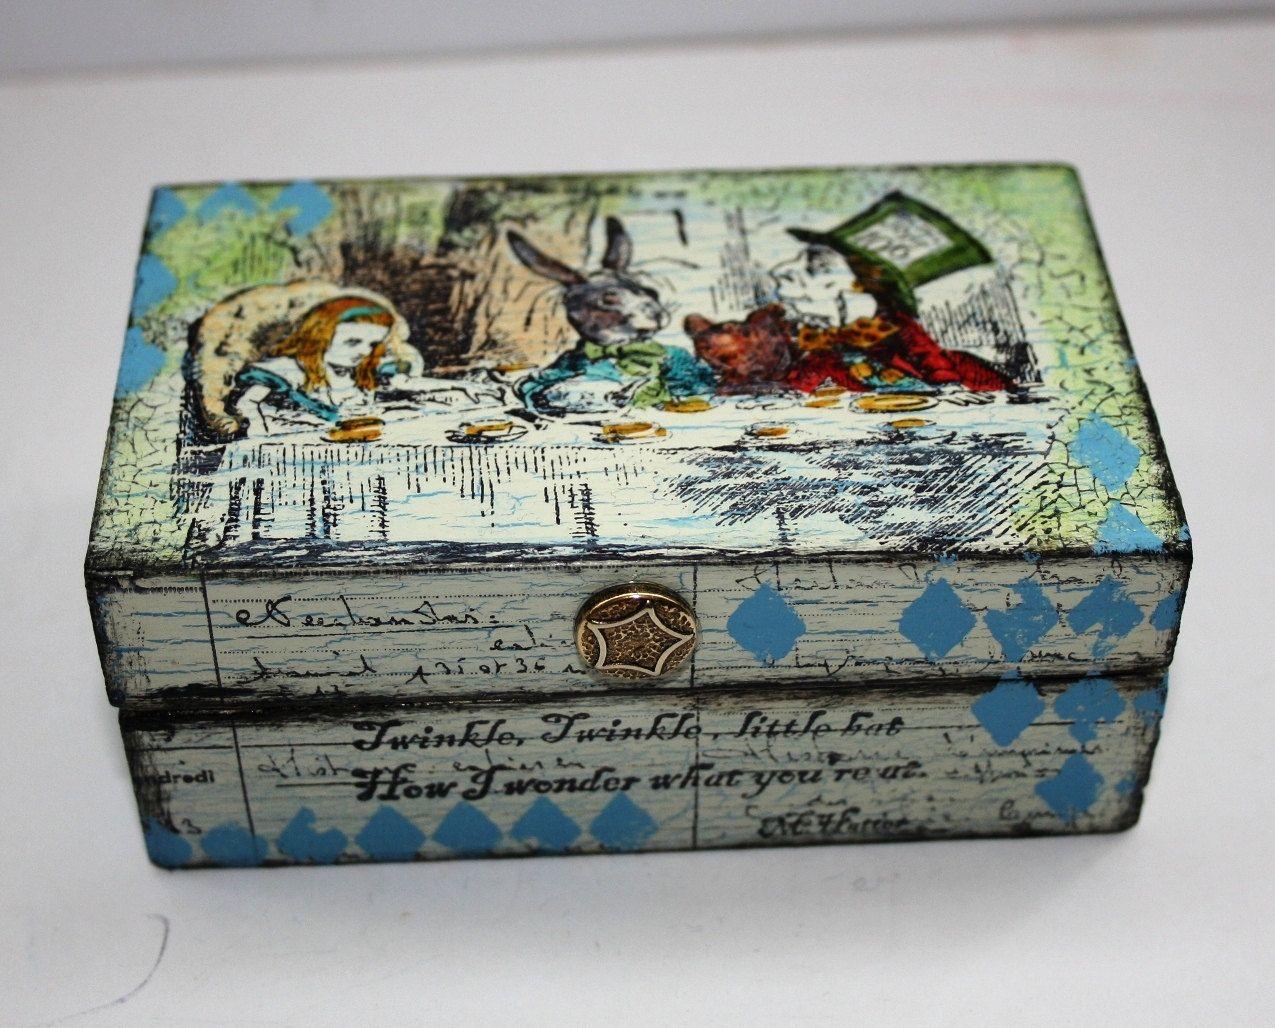 Alice In Wonderland Jewellery Box Hand Painted Trinket Fuse Bat Ideas Keepsake By Gingersalteredbits On Etsy